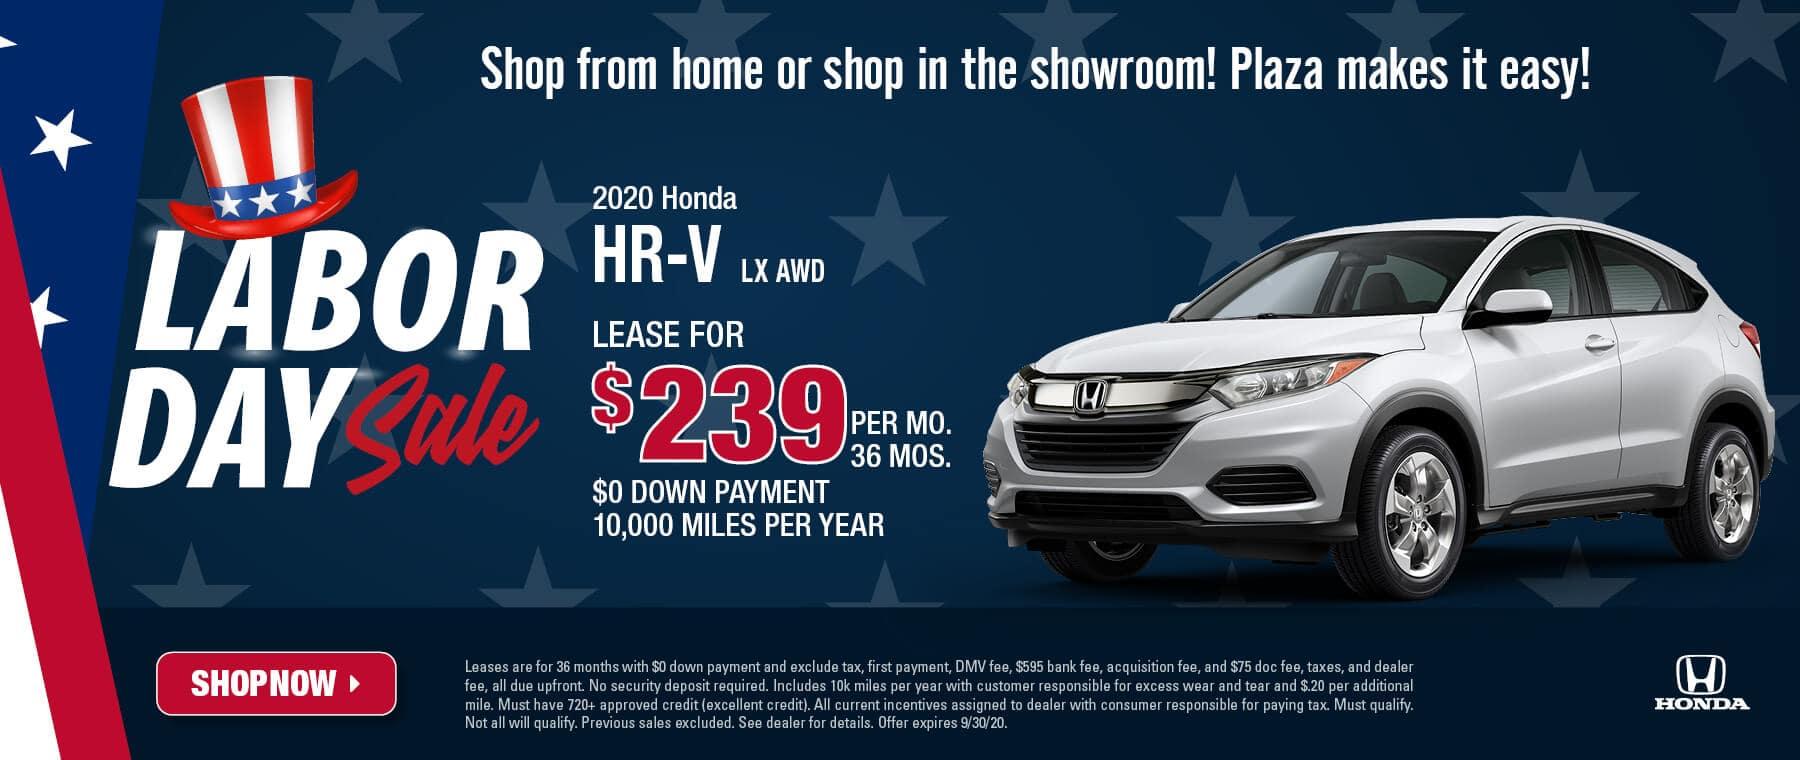 2020.09.23 Plaza Honda Sept Web 2 S48738mr-as5